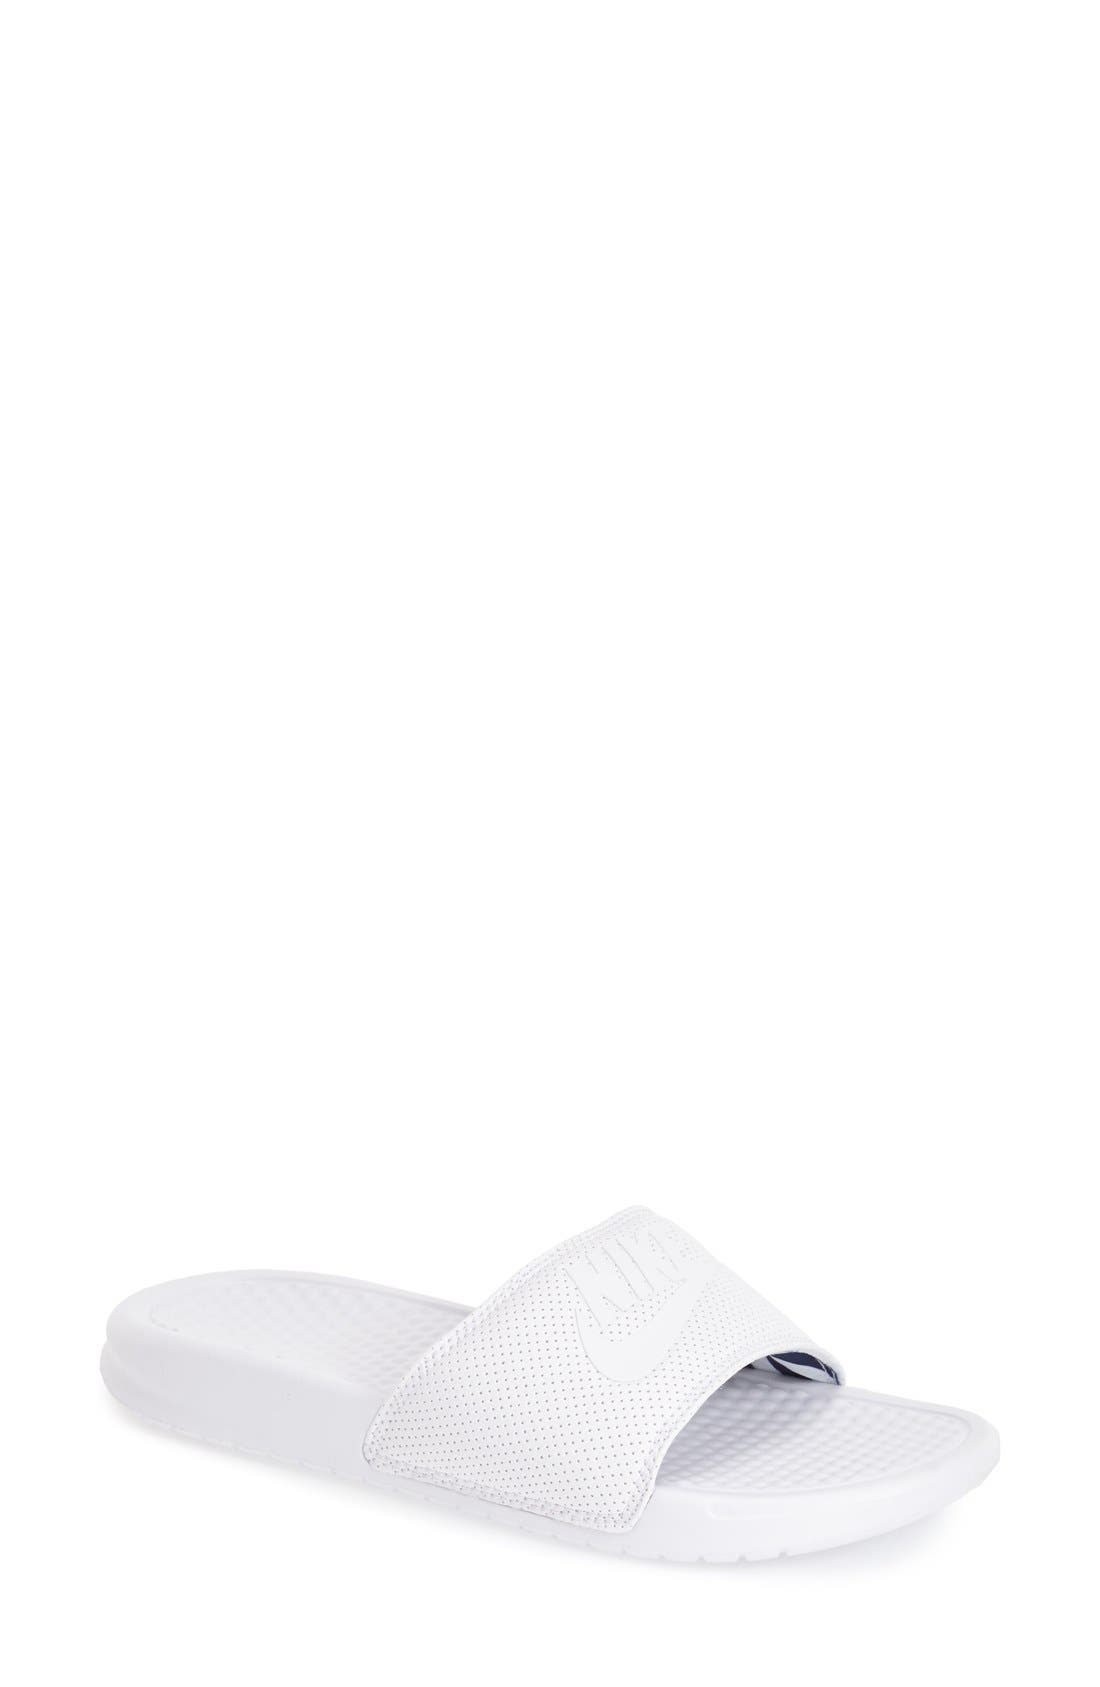 Main Image - Nike 'Benassi - Just Do It' Slide Sandal (Women)